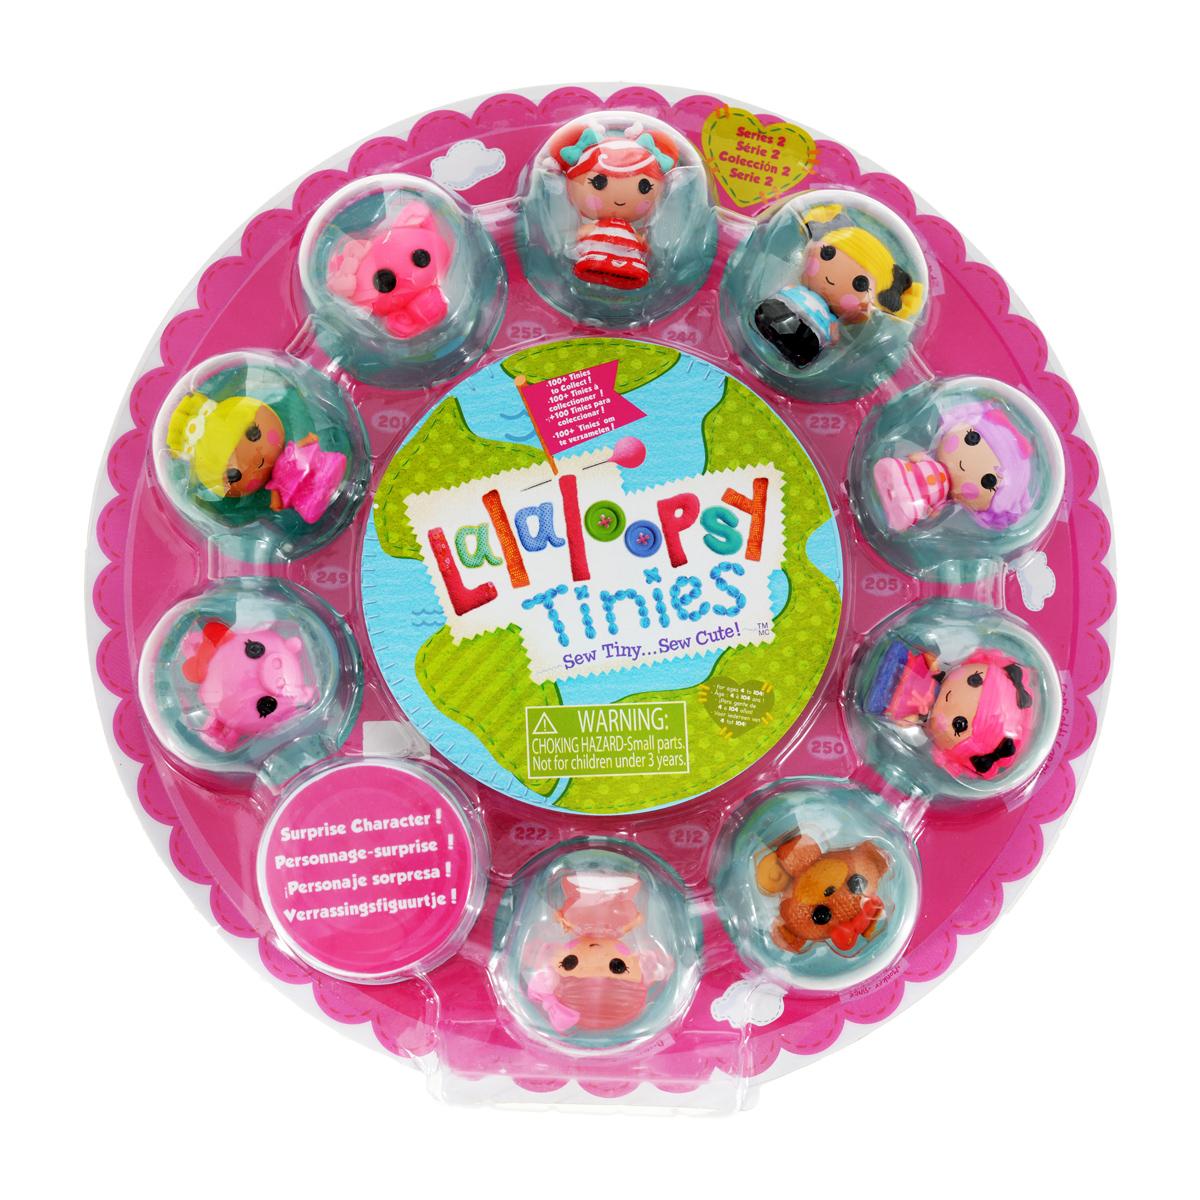 Lalaloopsy Набор фигурок Малютки Series 2 цвет розовый lalaloopsy малютки